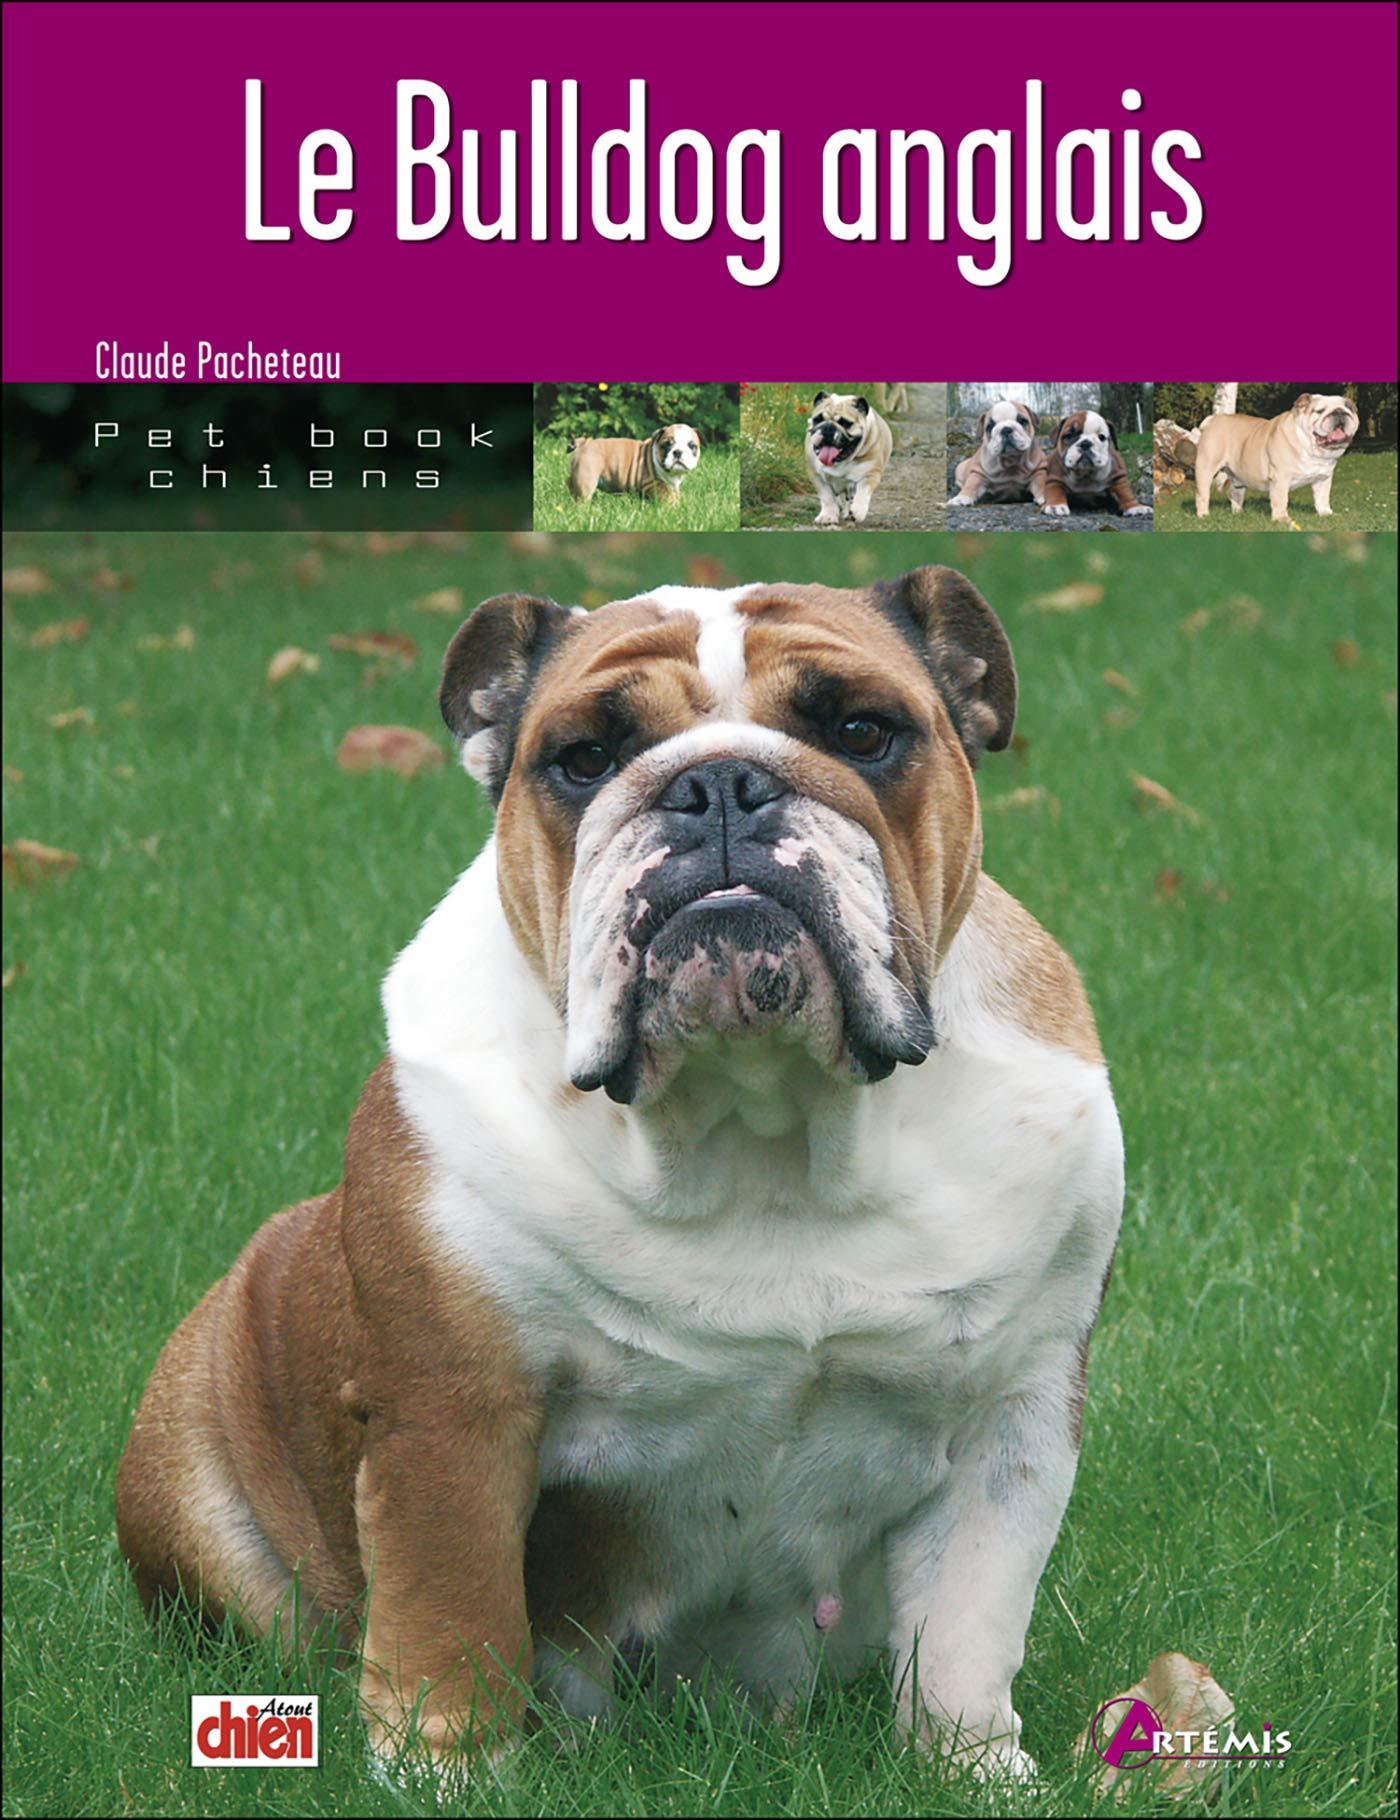 Bulldog Anglais Le Amazonca Claude Pacheteau Books